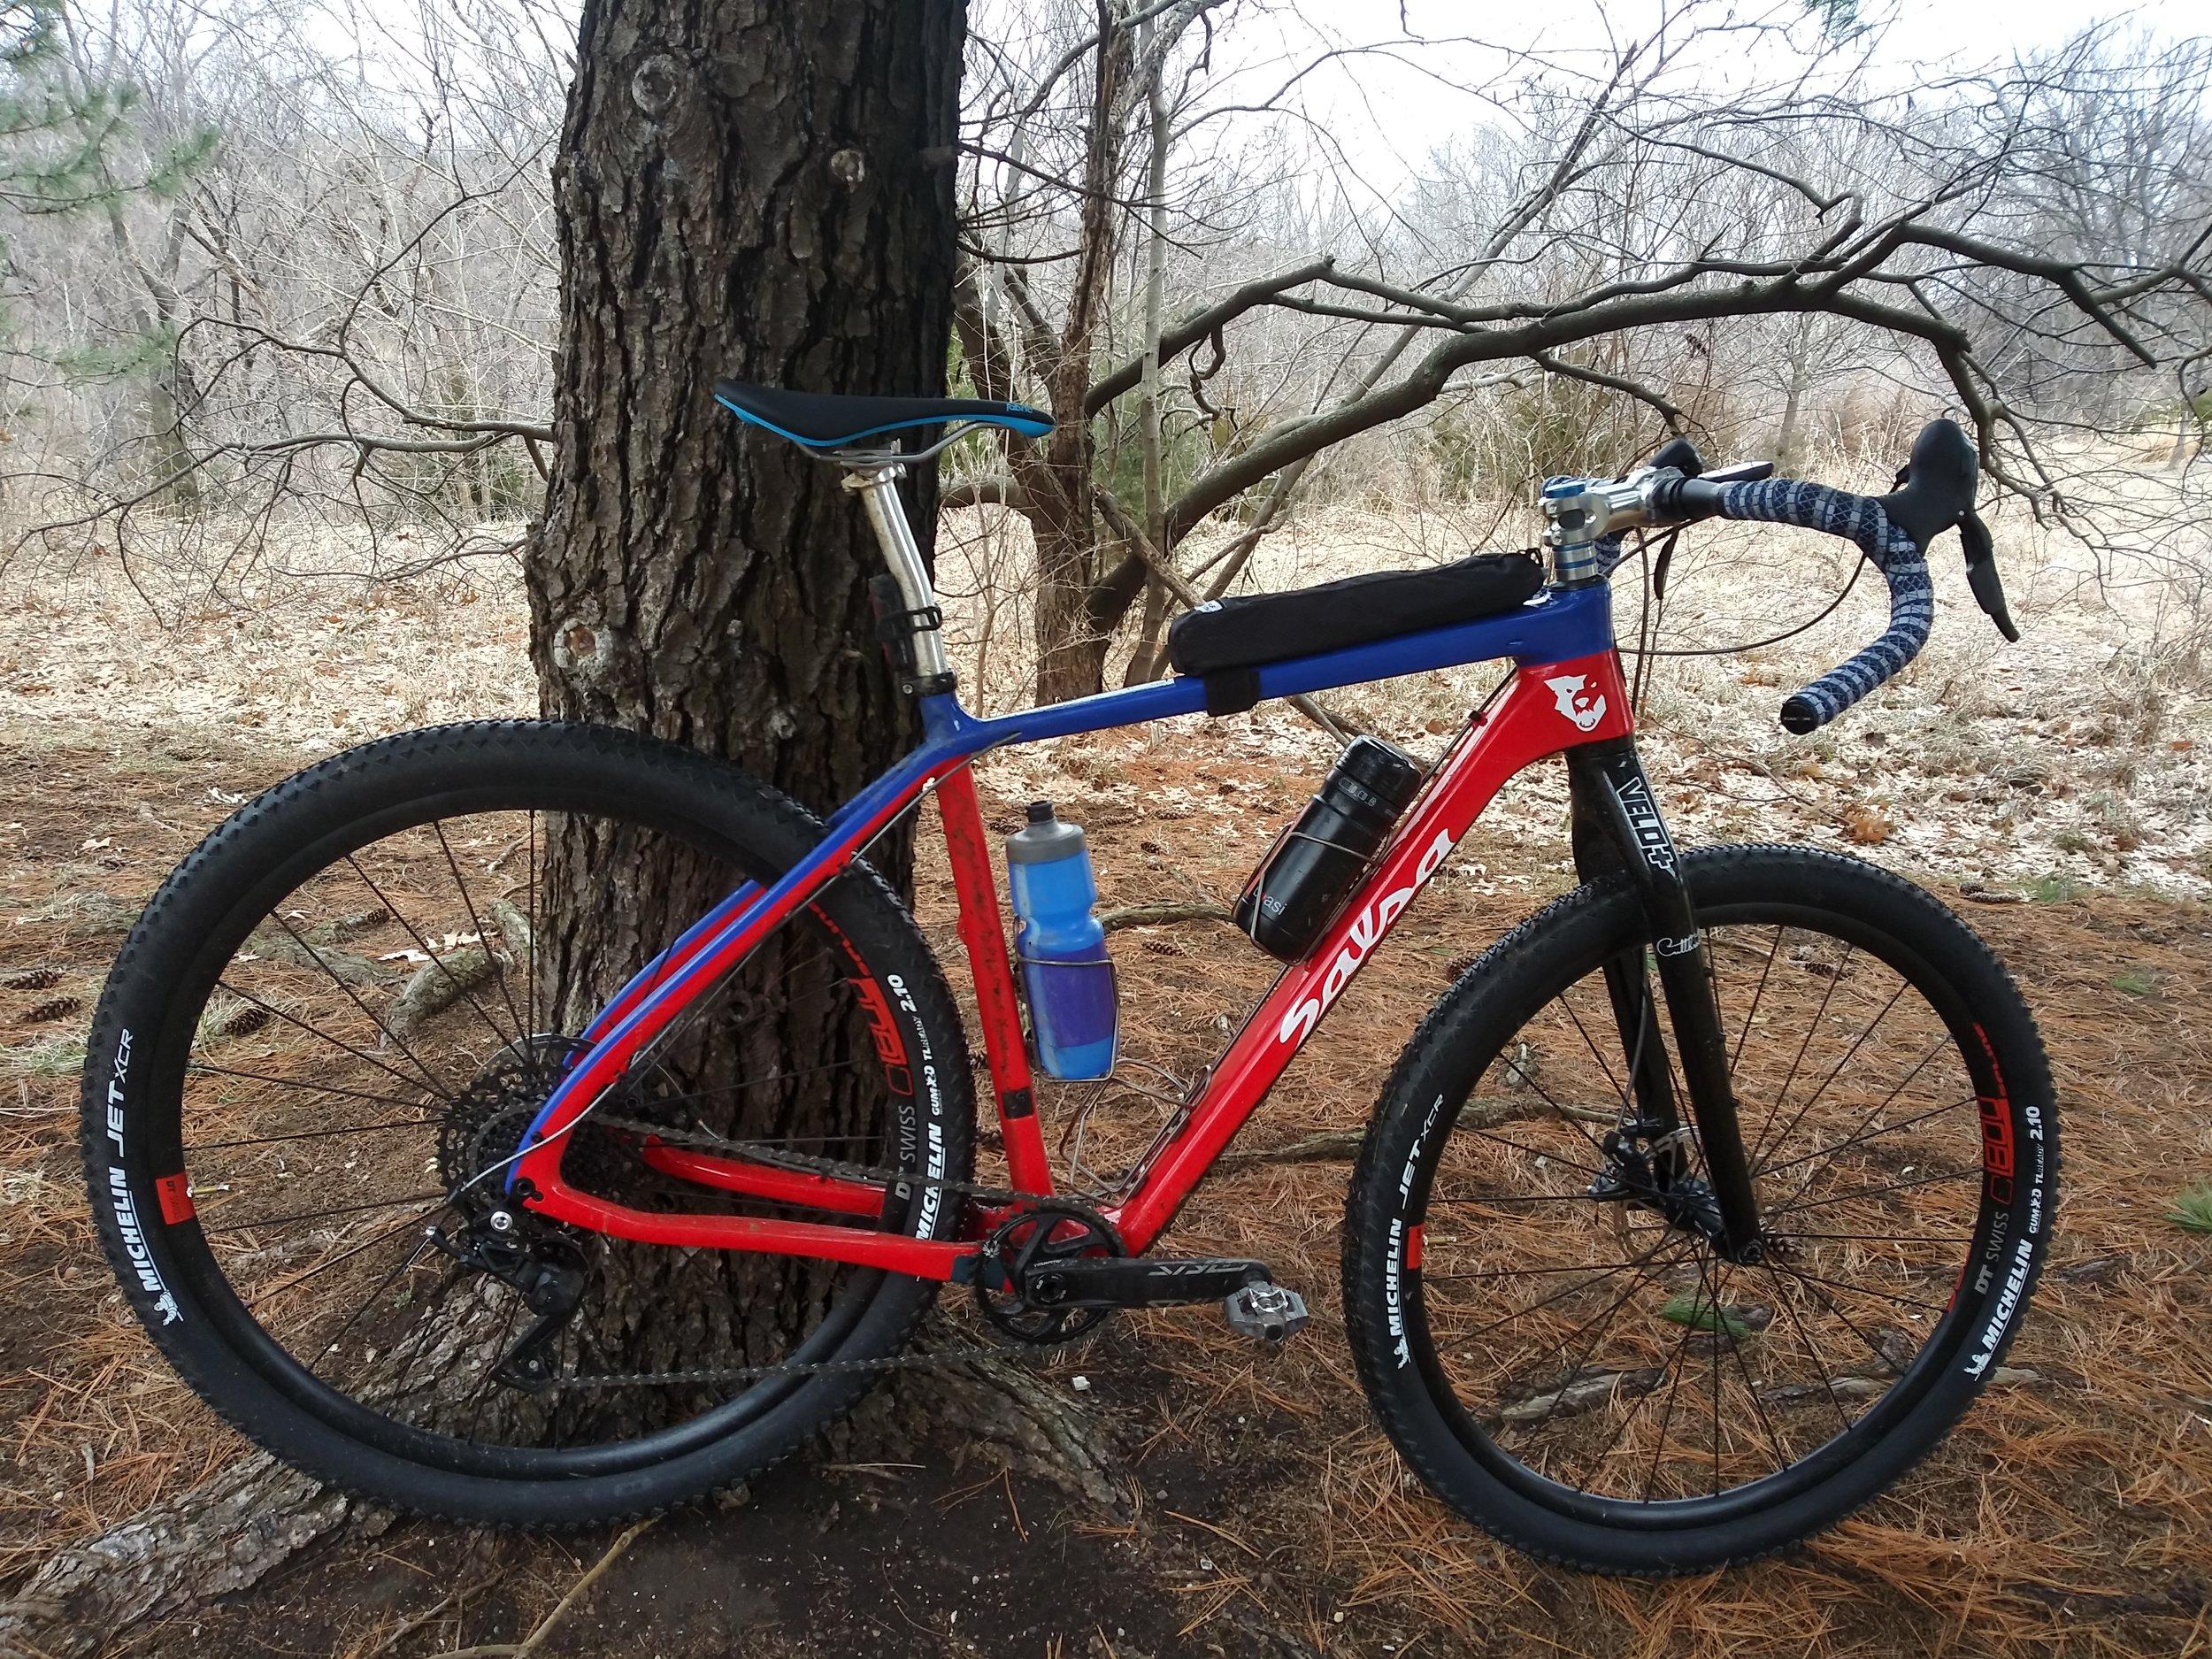 Salsa Cutthroat Rival 1 - The do-it-all dropbar mountain bike